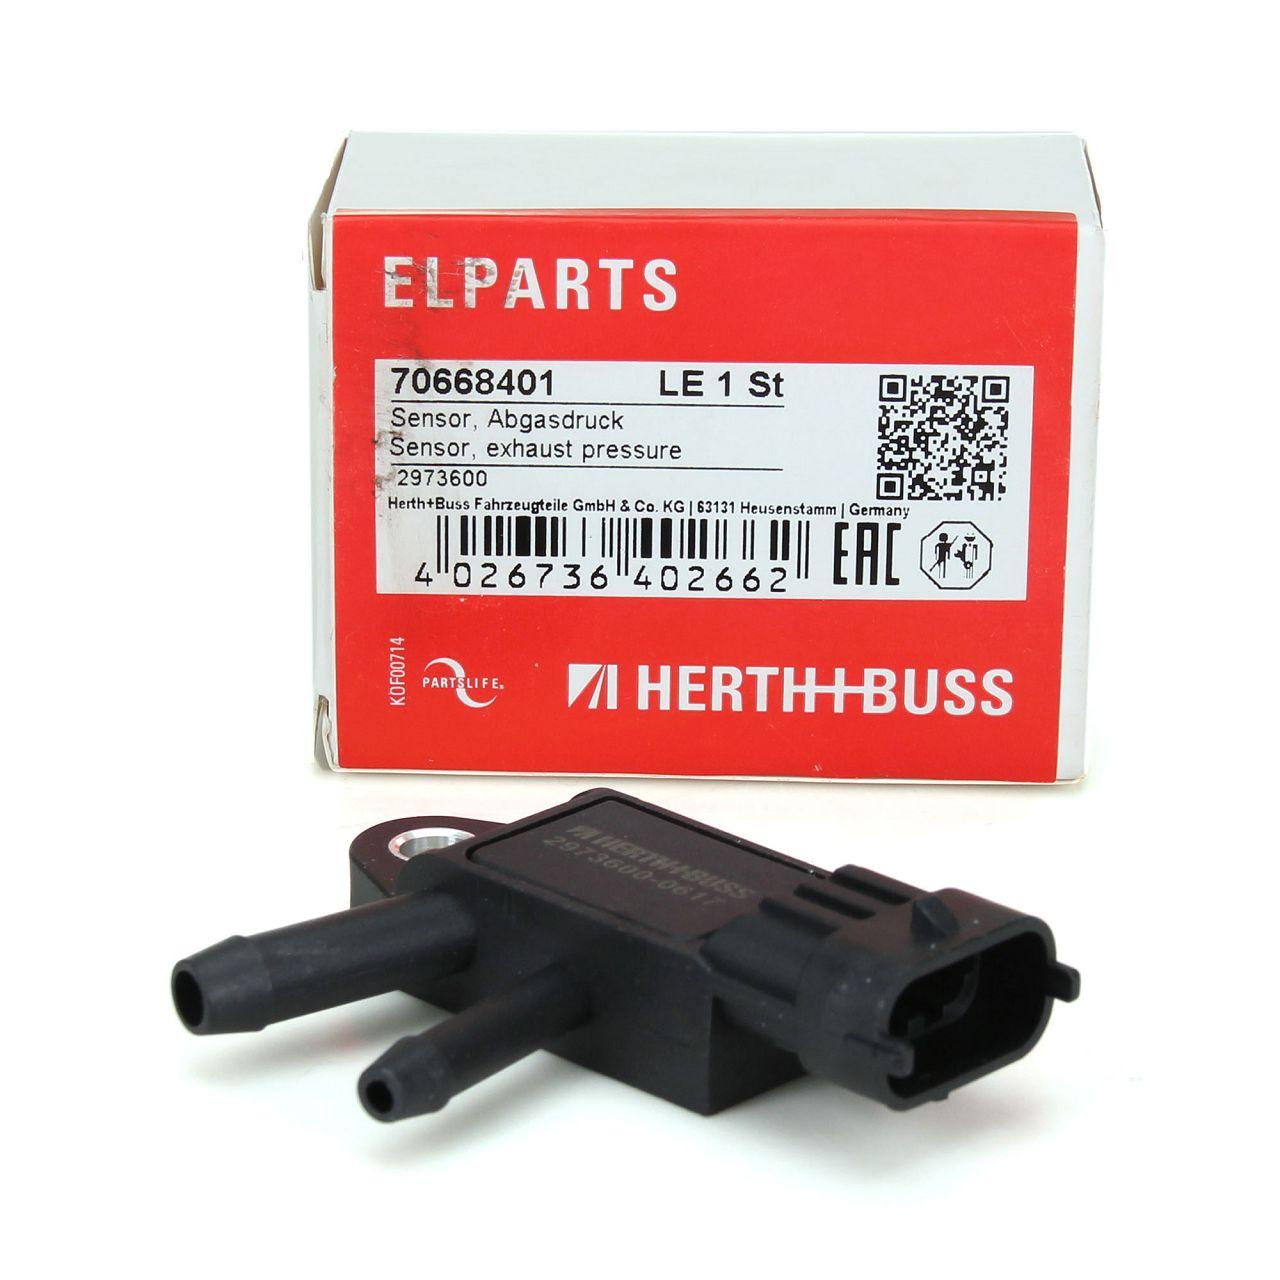 HERTH+BUSS ELPARTS Abgasdrucksensor 70668401 für ALFA ROMEO FIAT LANCIA OPEL